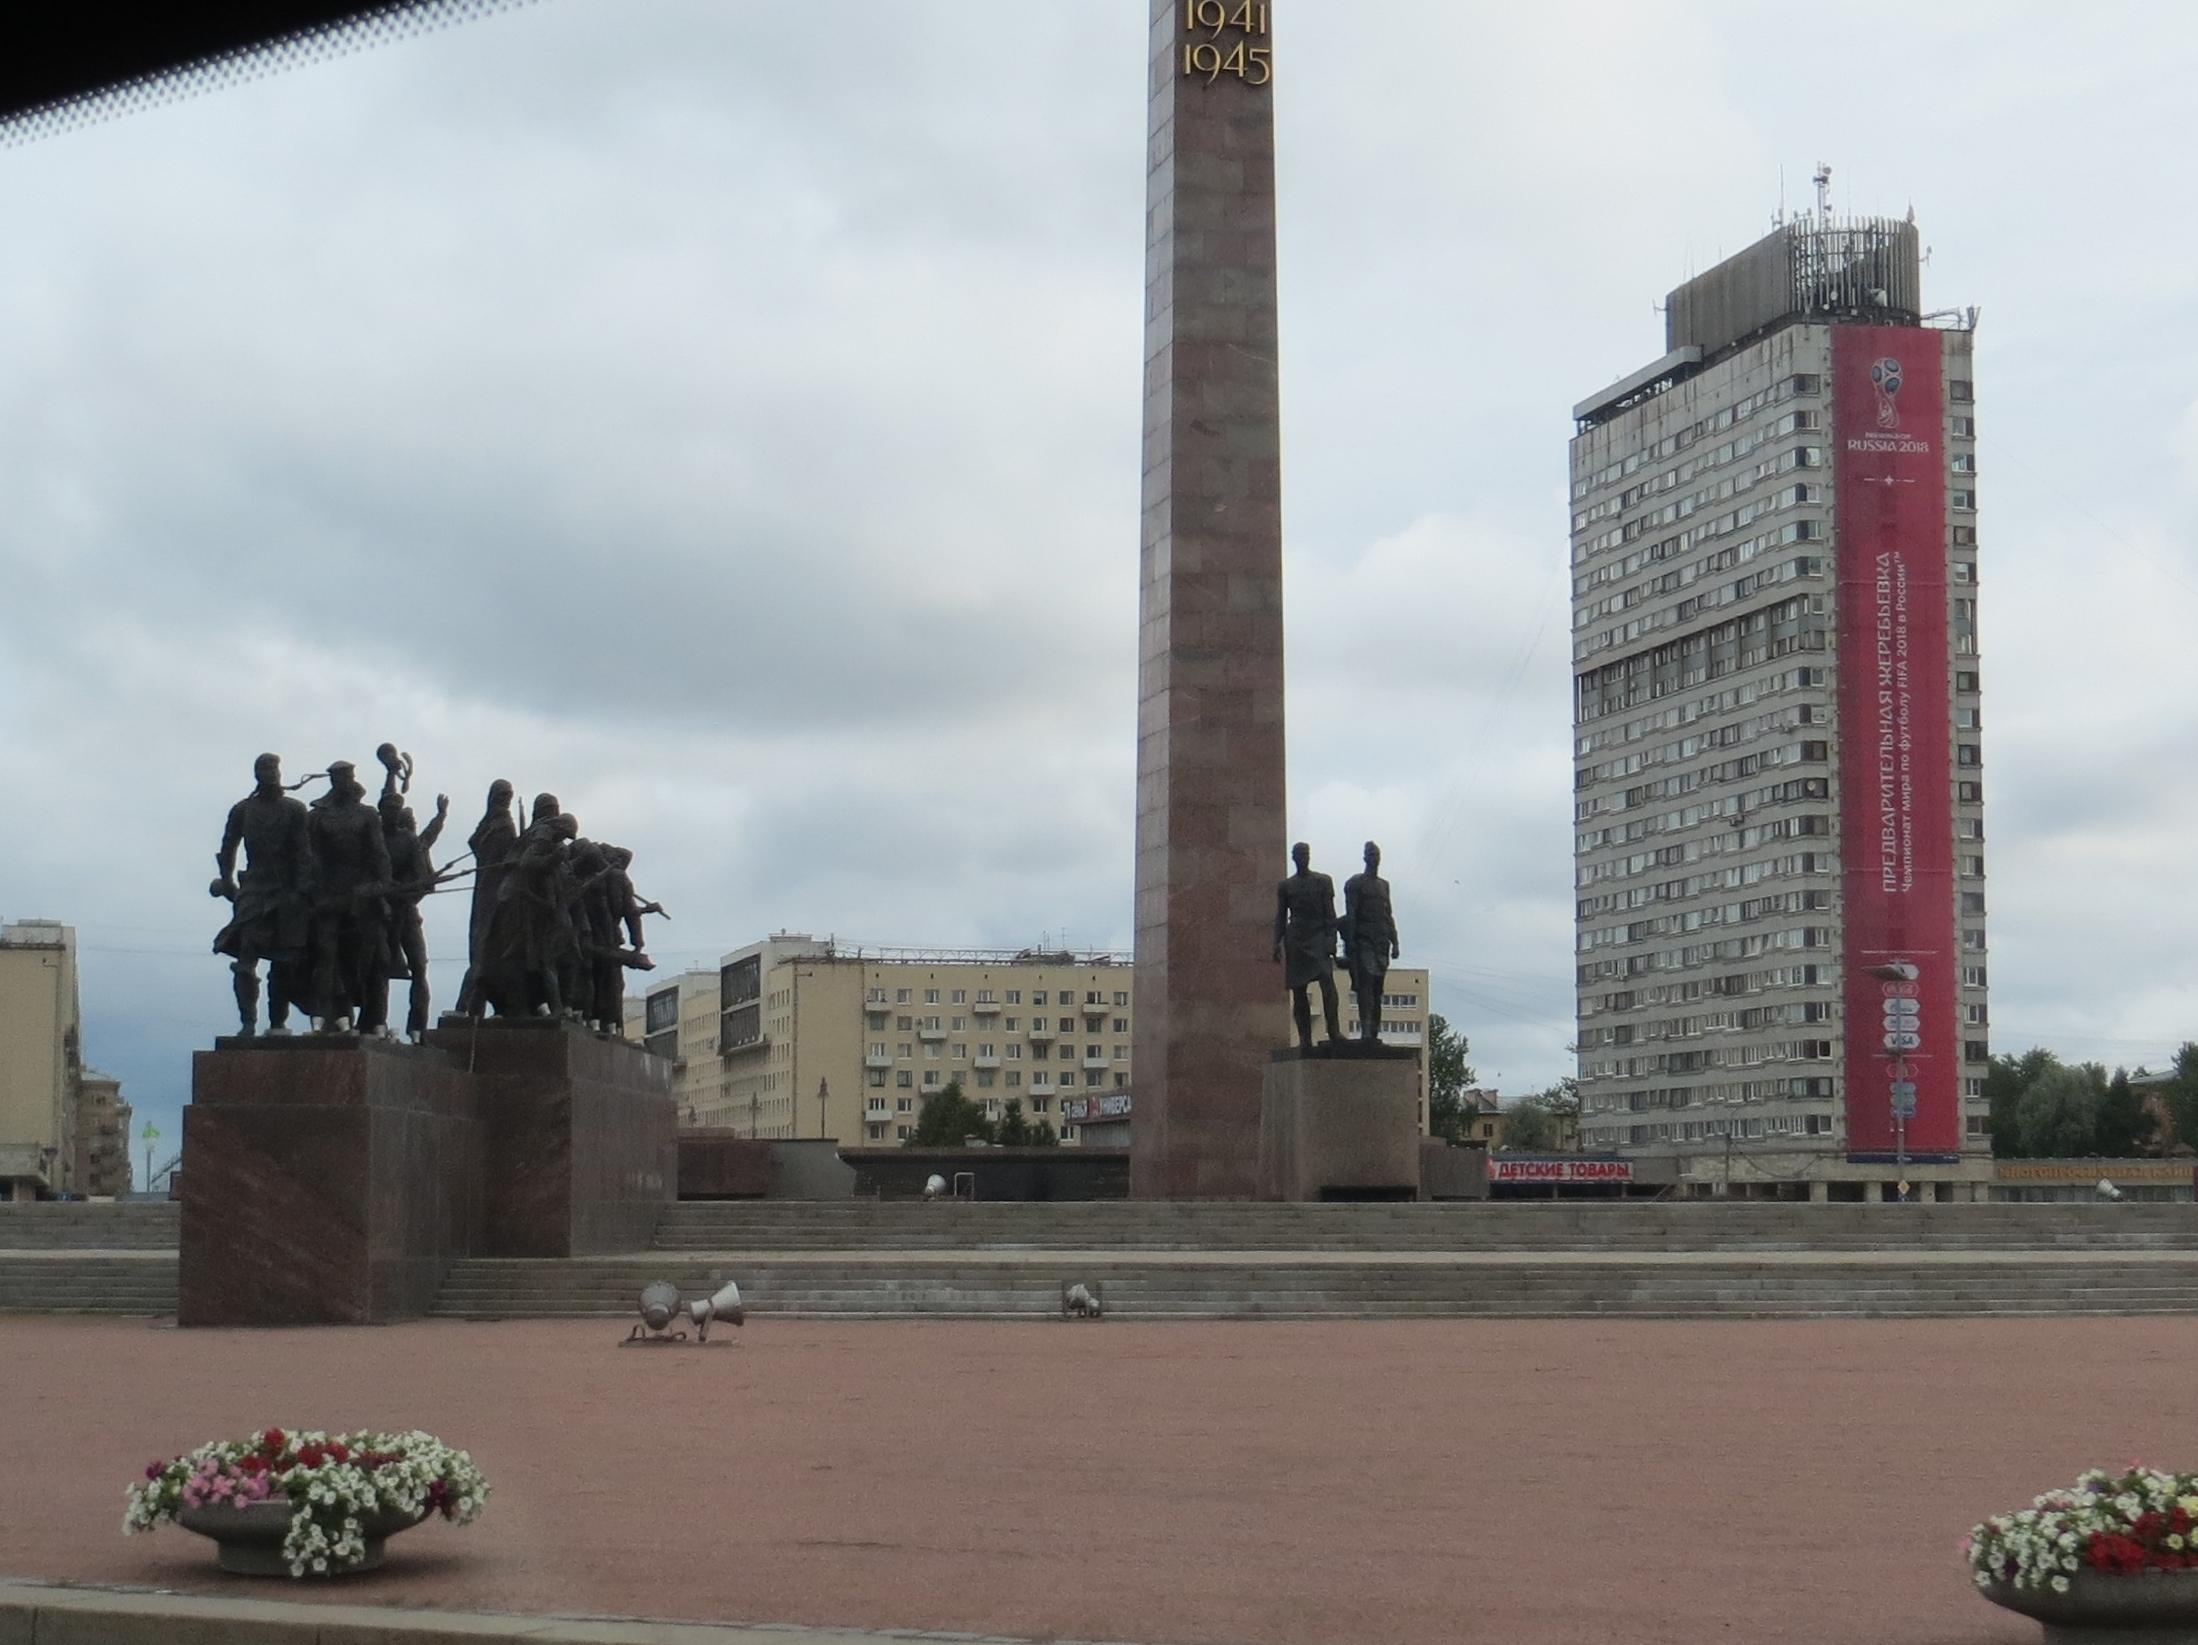 St. Petersburg Russia Leningrad